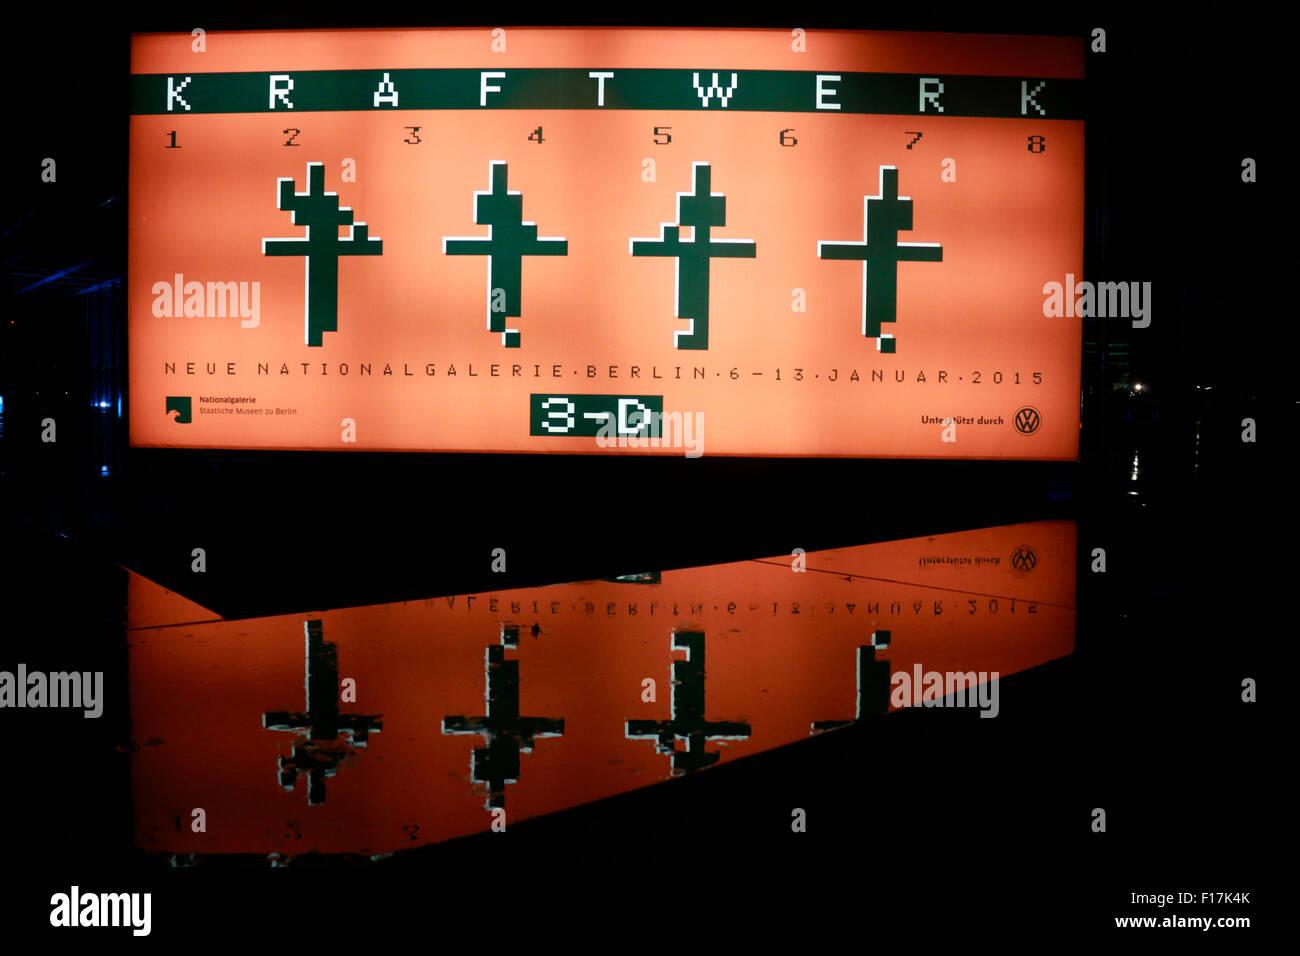 "Konzert der Band ""Kraftwerk"", Neue Nationalgalerie, 8. Januar 2015, Berlin. Stock Photo"